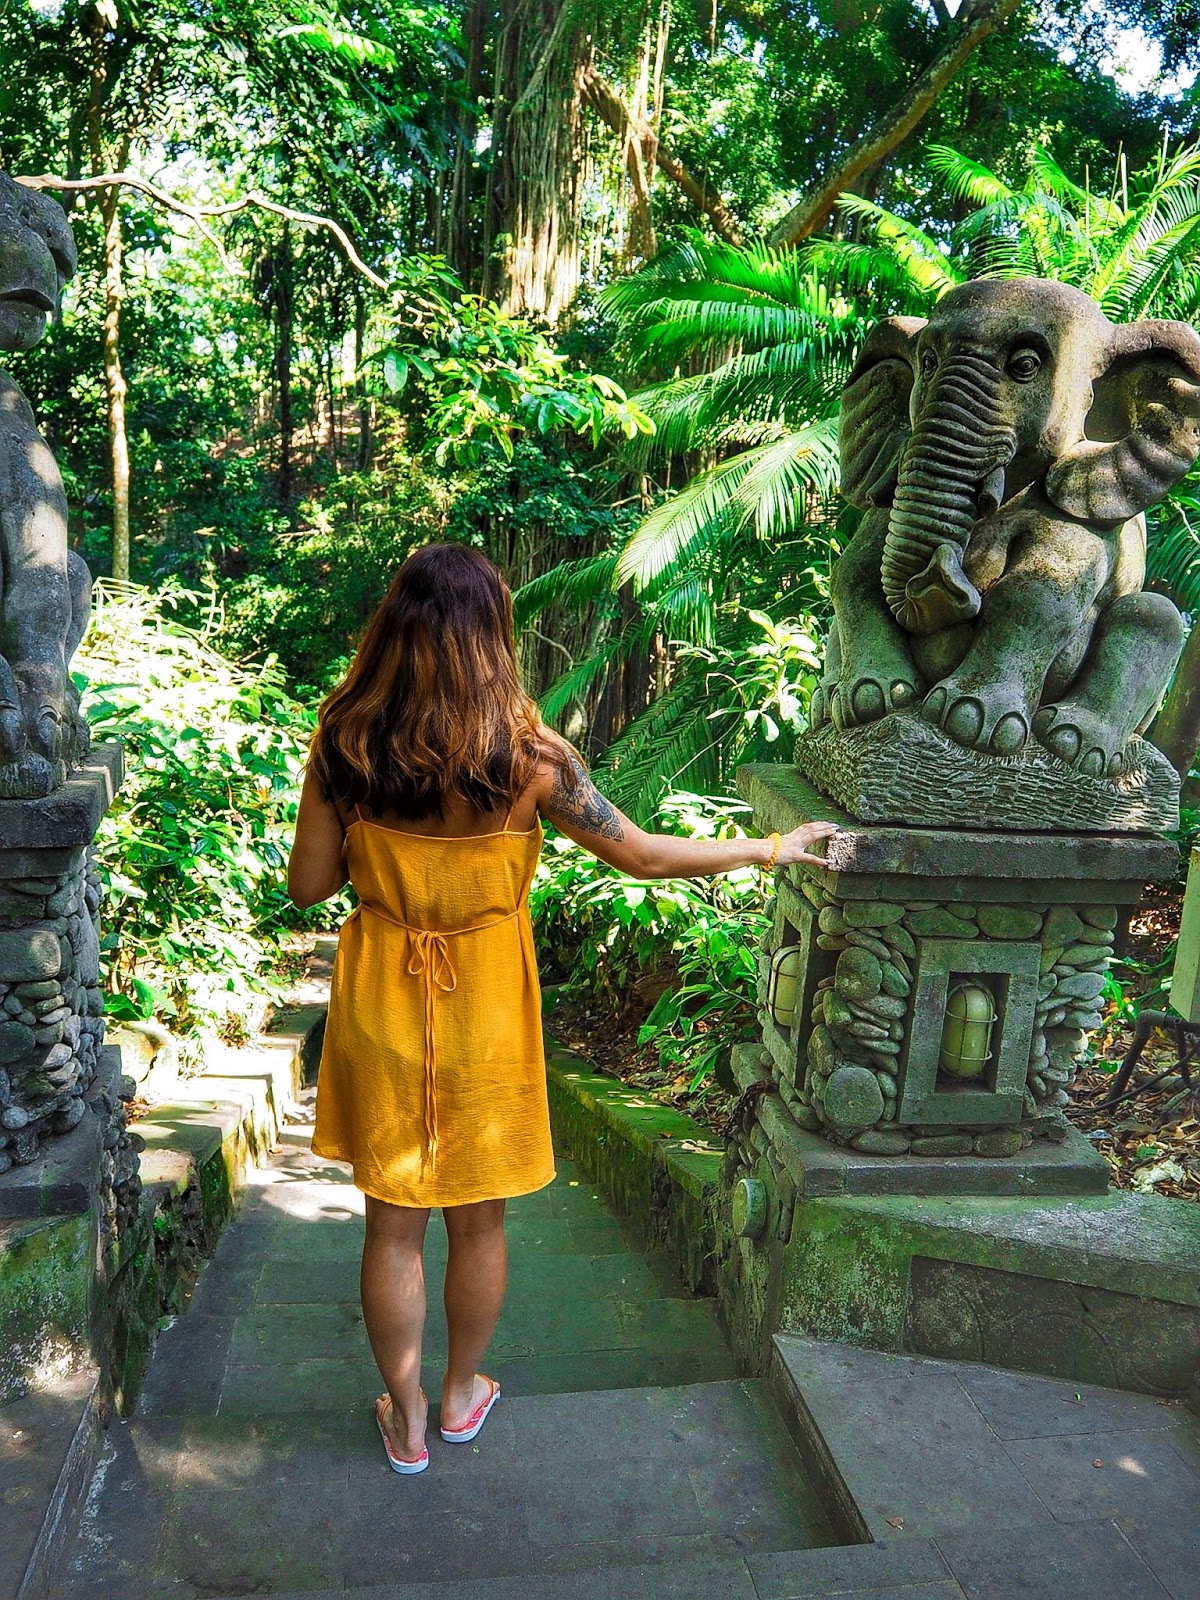 Coping with long haul flights - Bali